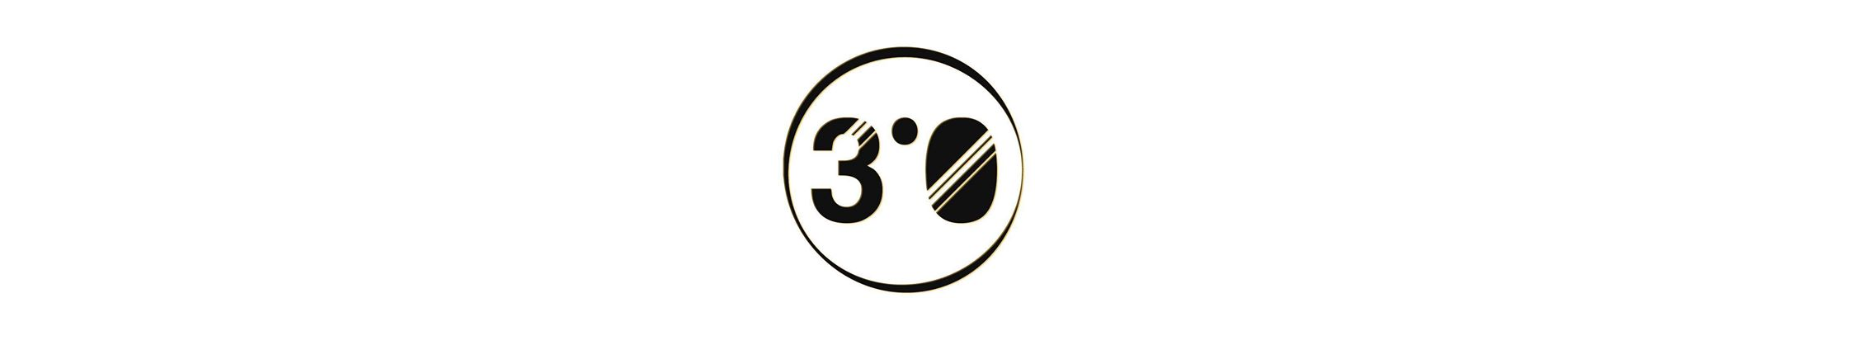 Associazione TREpuntoZERO Dance Studio ASD - logo